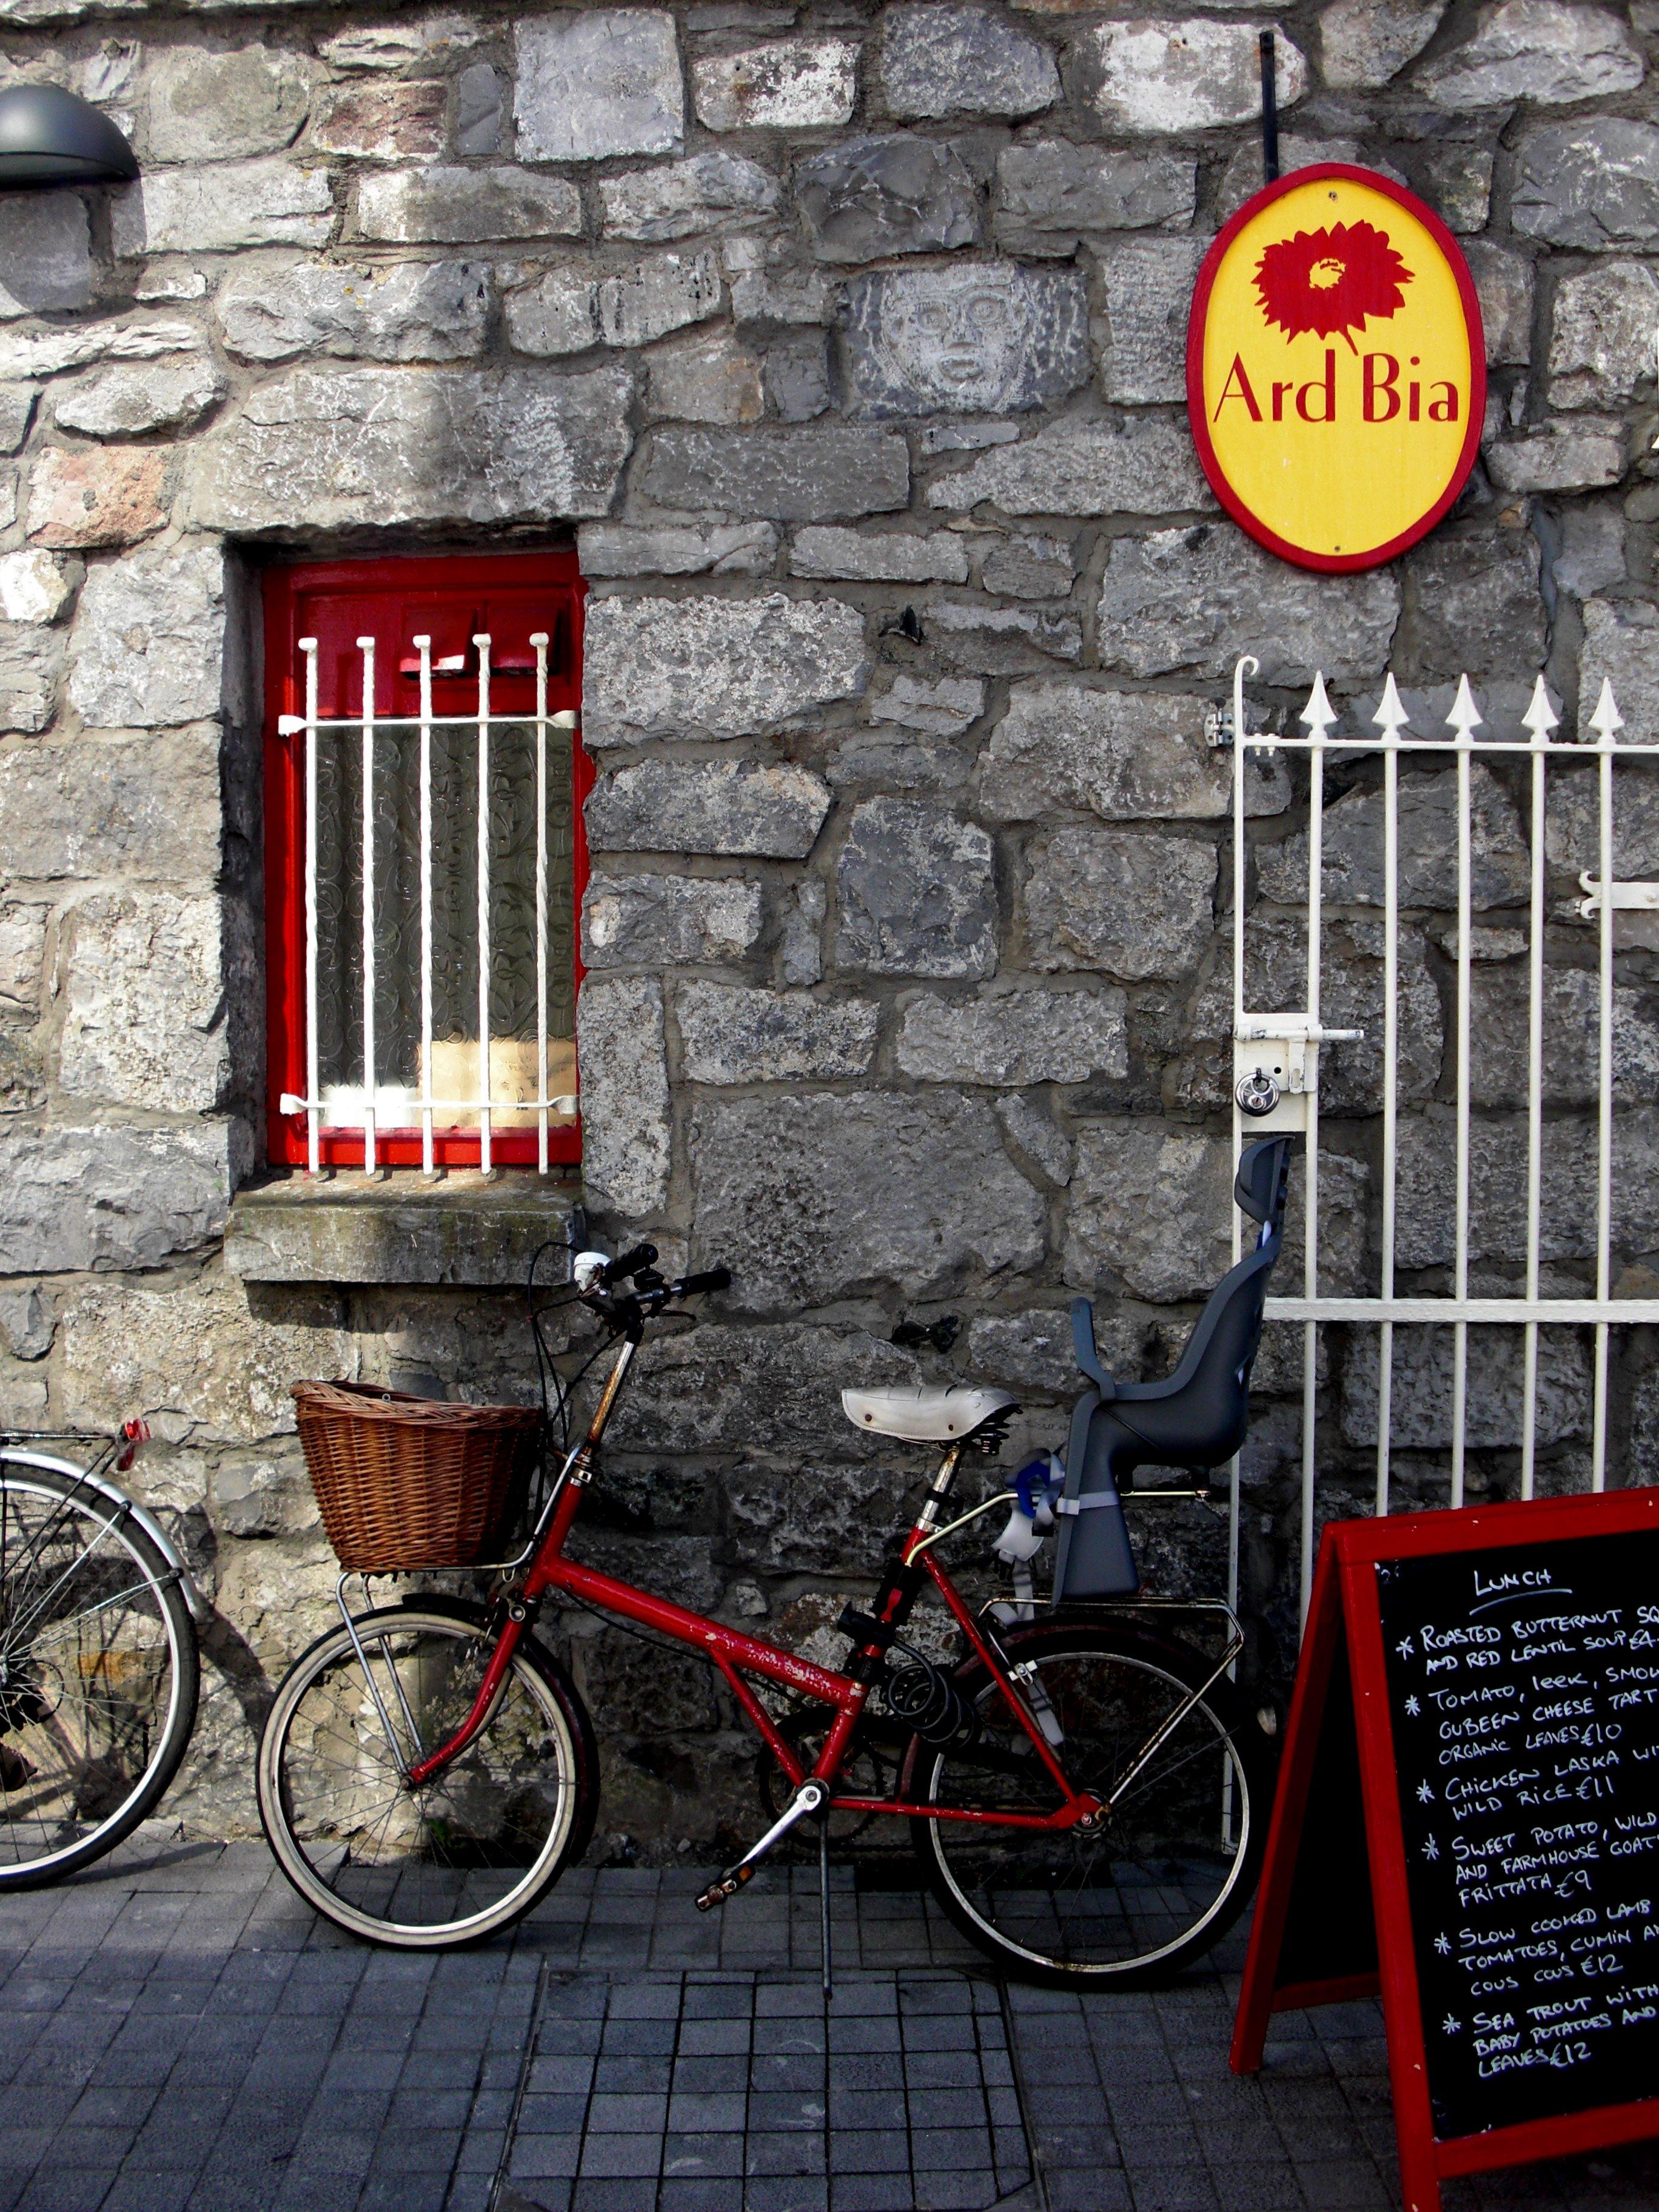 Bike & Bistro, Bicycle, Lean, Vacation, Travel, HQ Photo